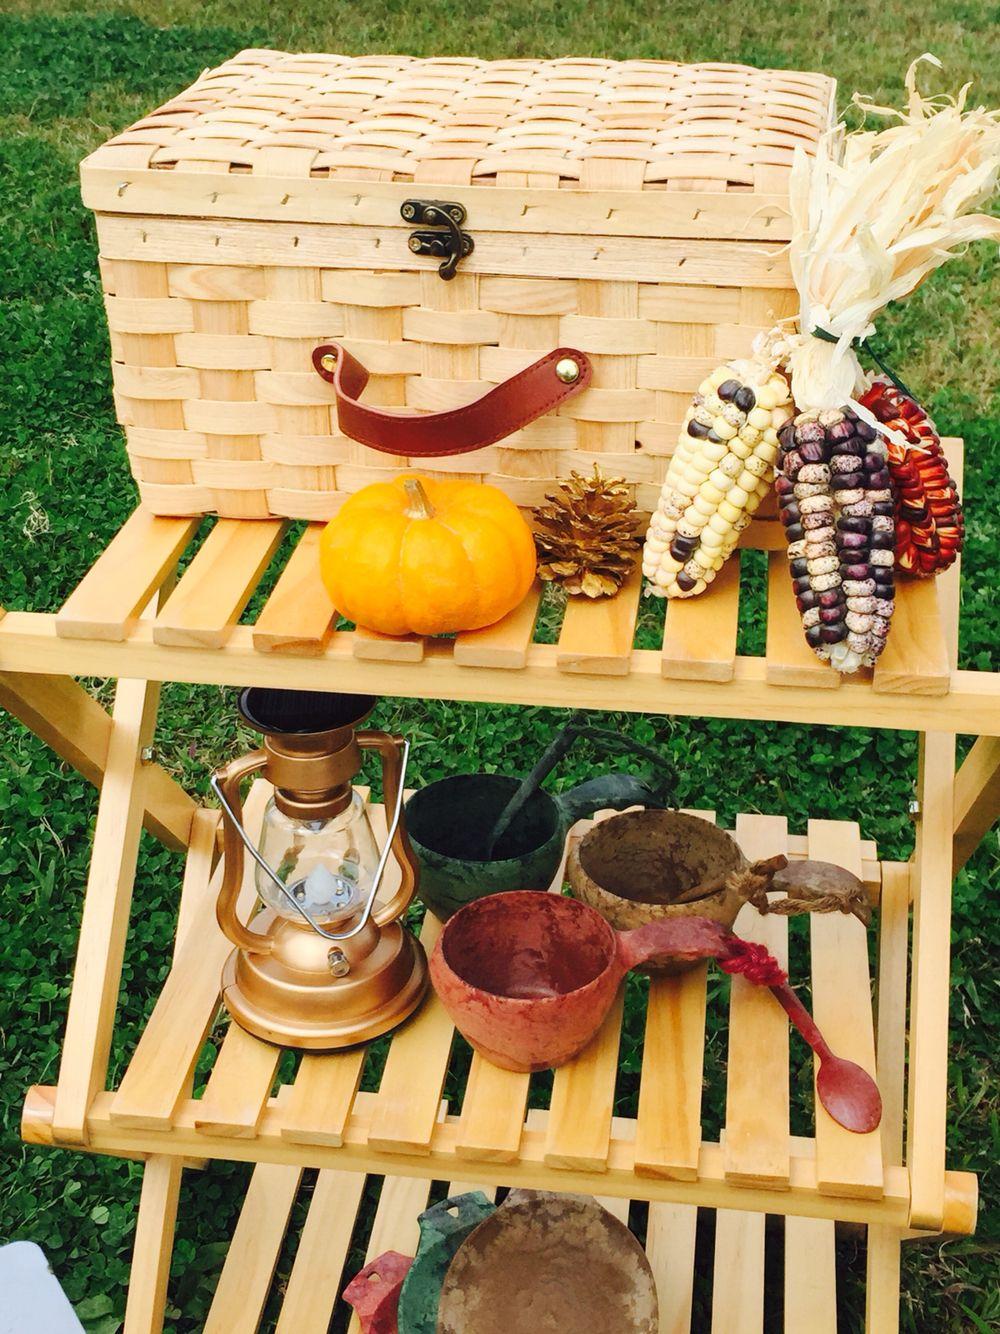 My Great Outdoor camping Tools | Camping tools, Picnic ...